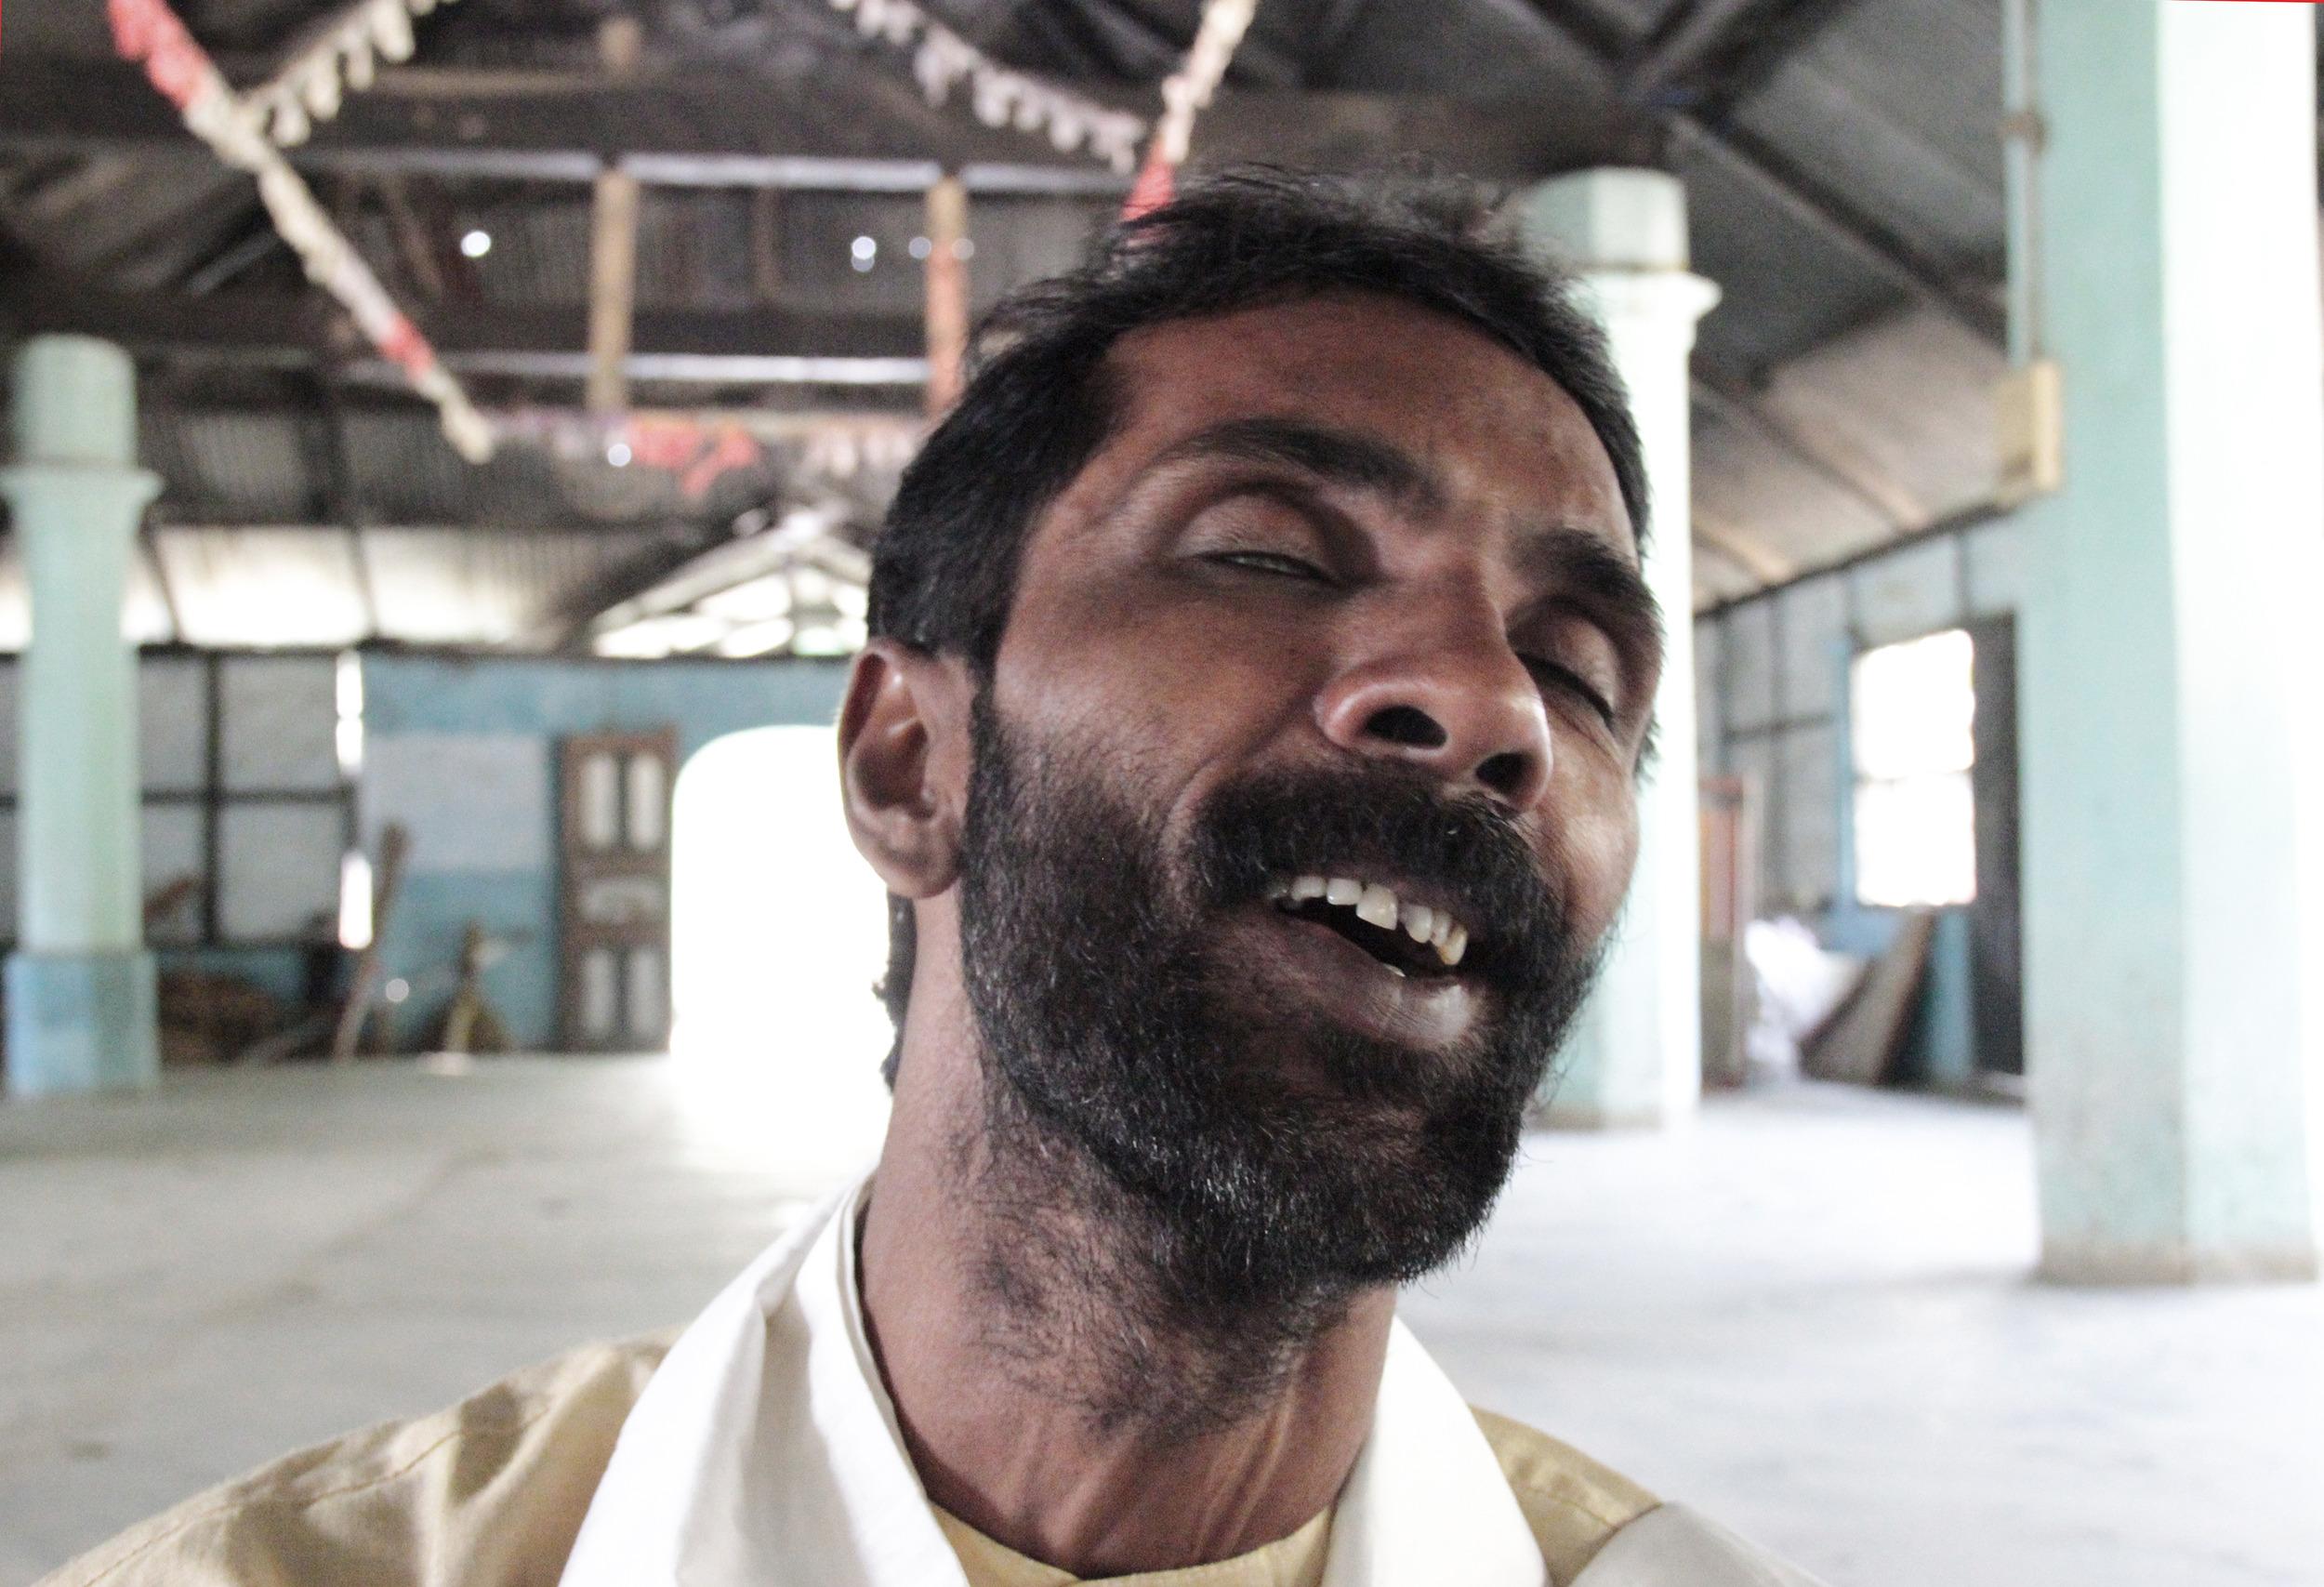 Bishnu Das (singer), Majuli Island, January 2014 © Edith Nicol